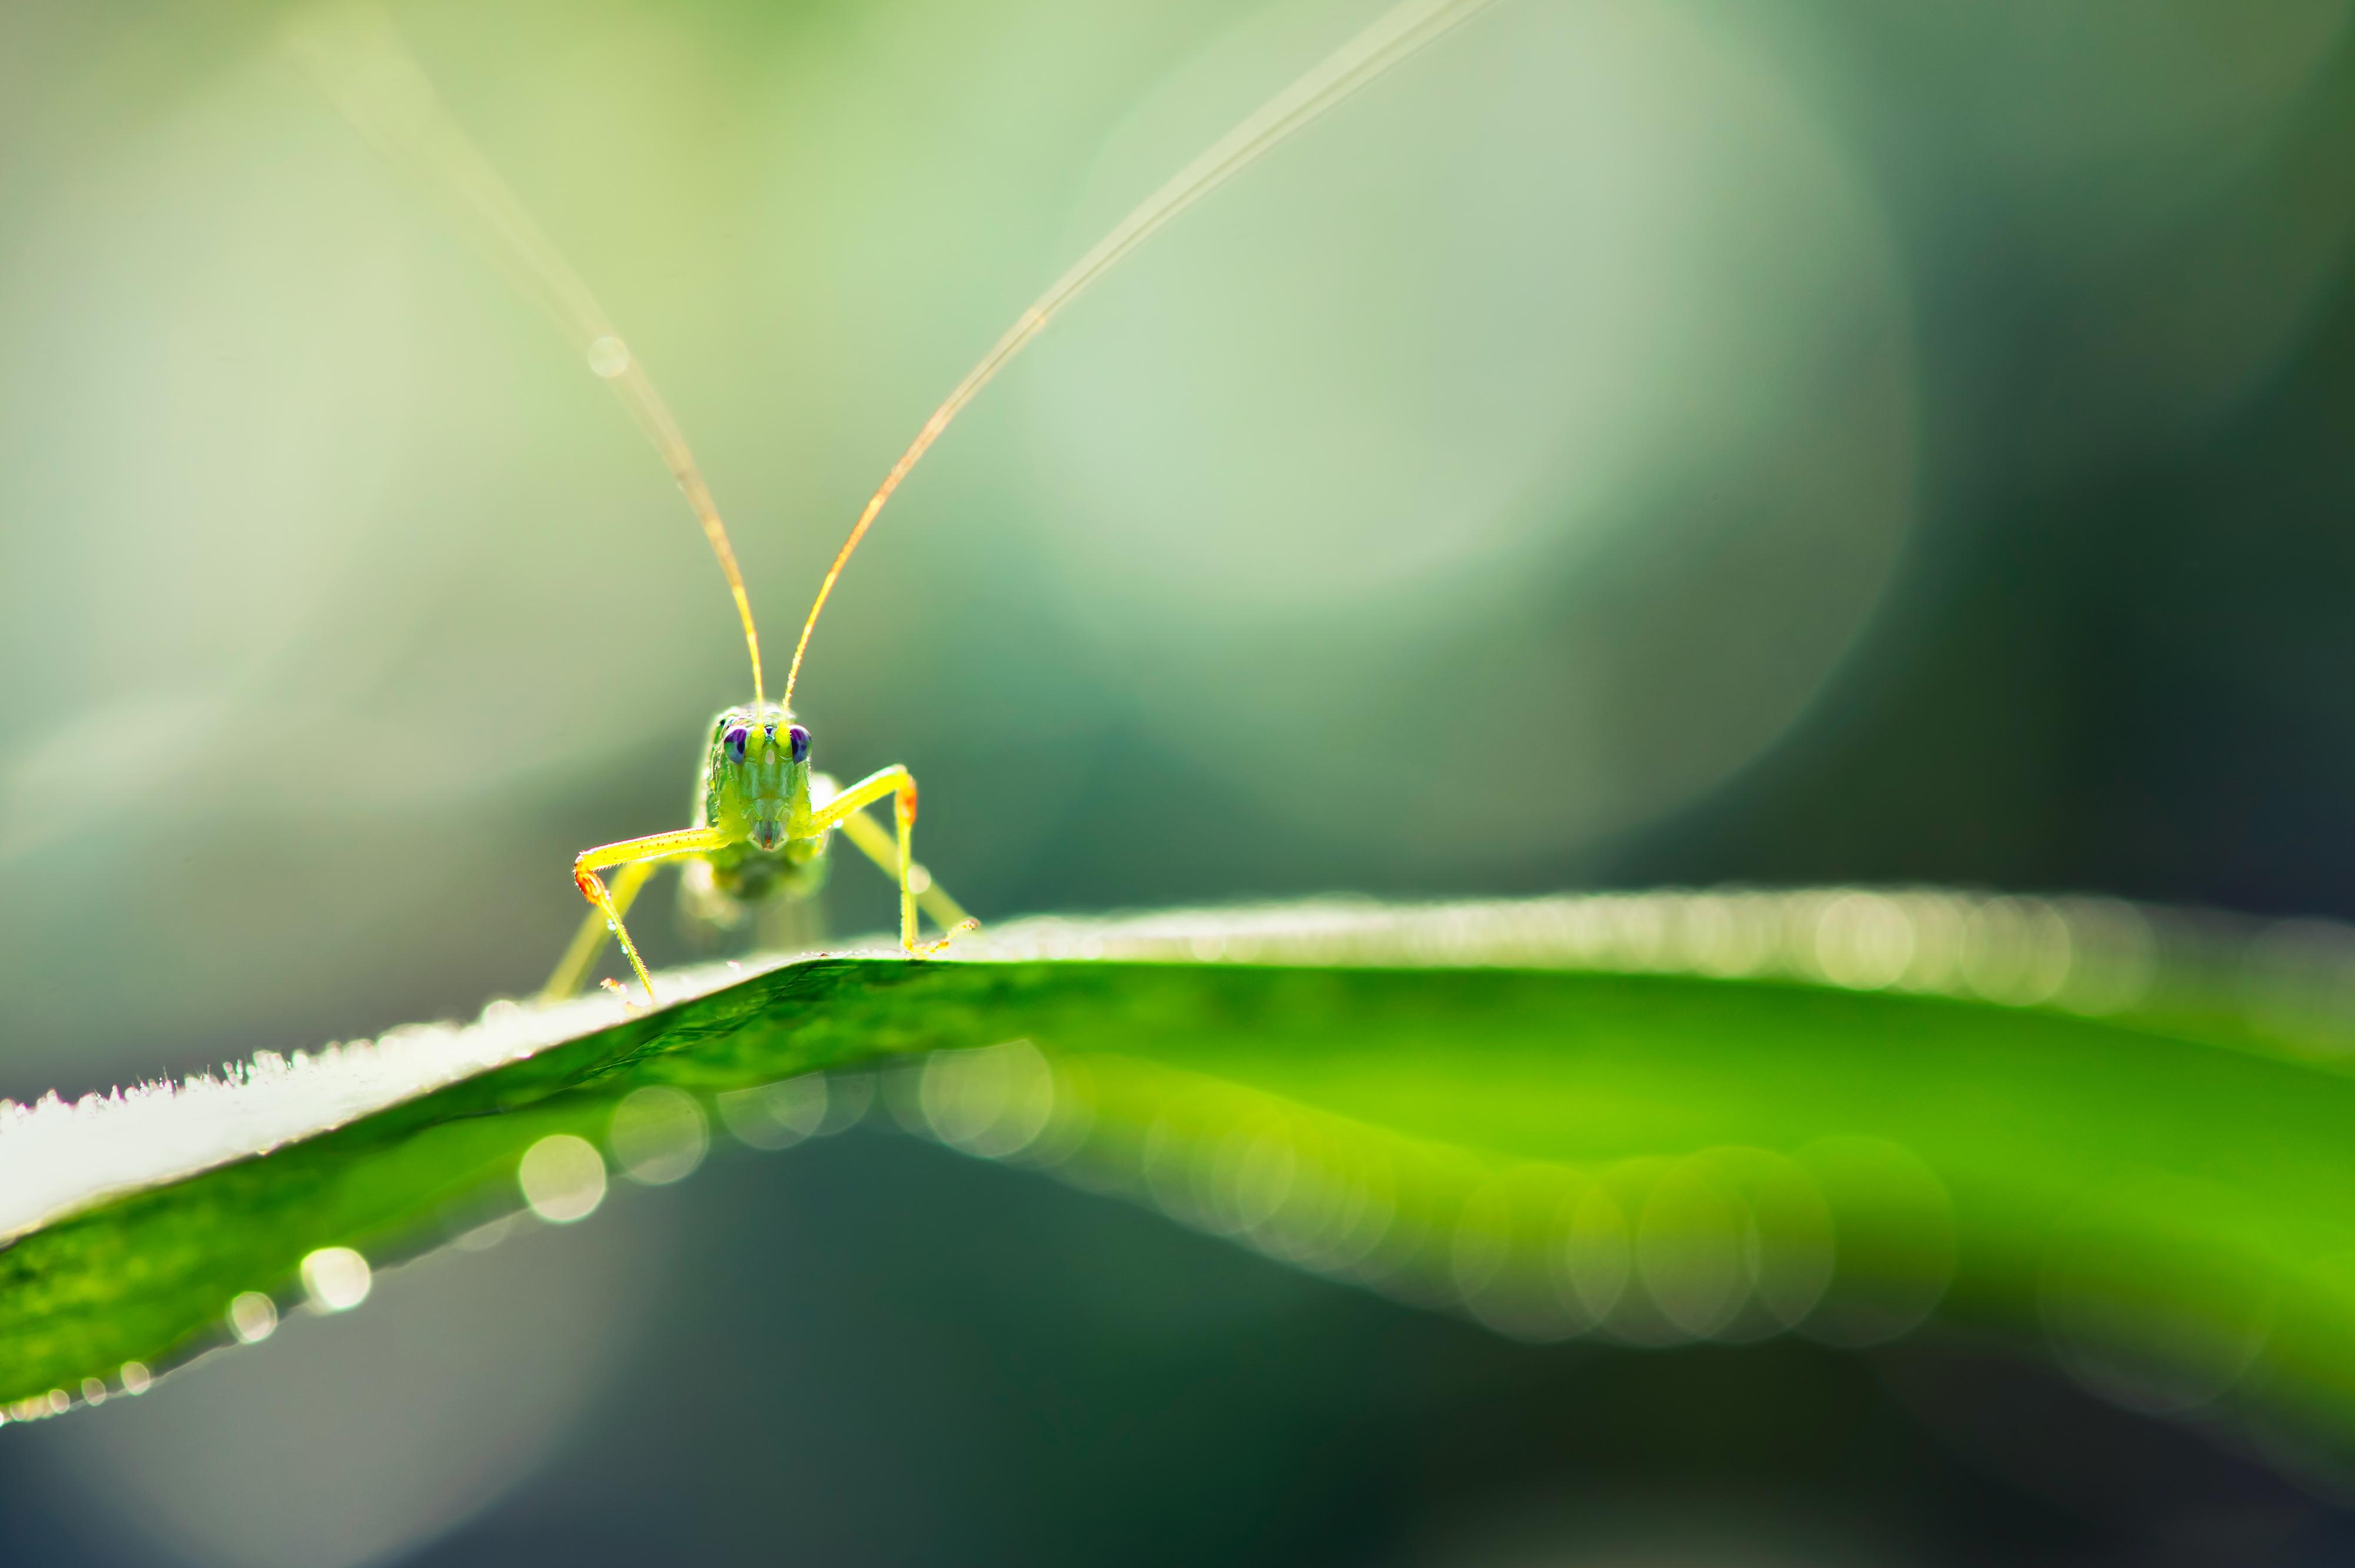 Cool Cute Wallpaper For Iphone Grasshopper 4k Ultra Hd Wallpaper Background Image